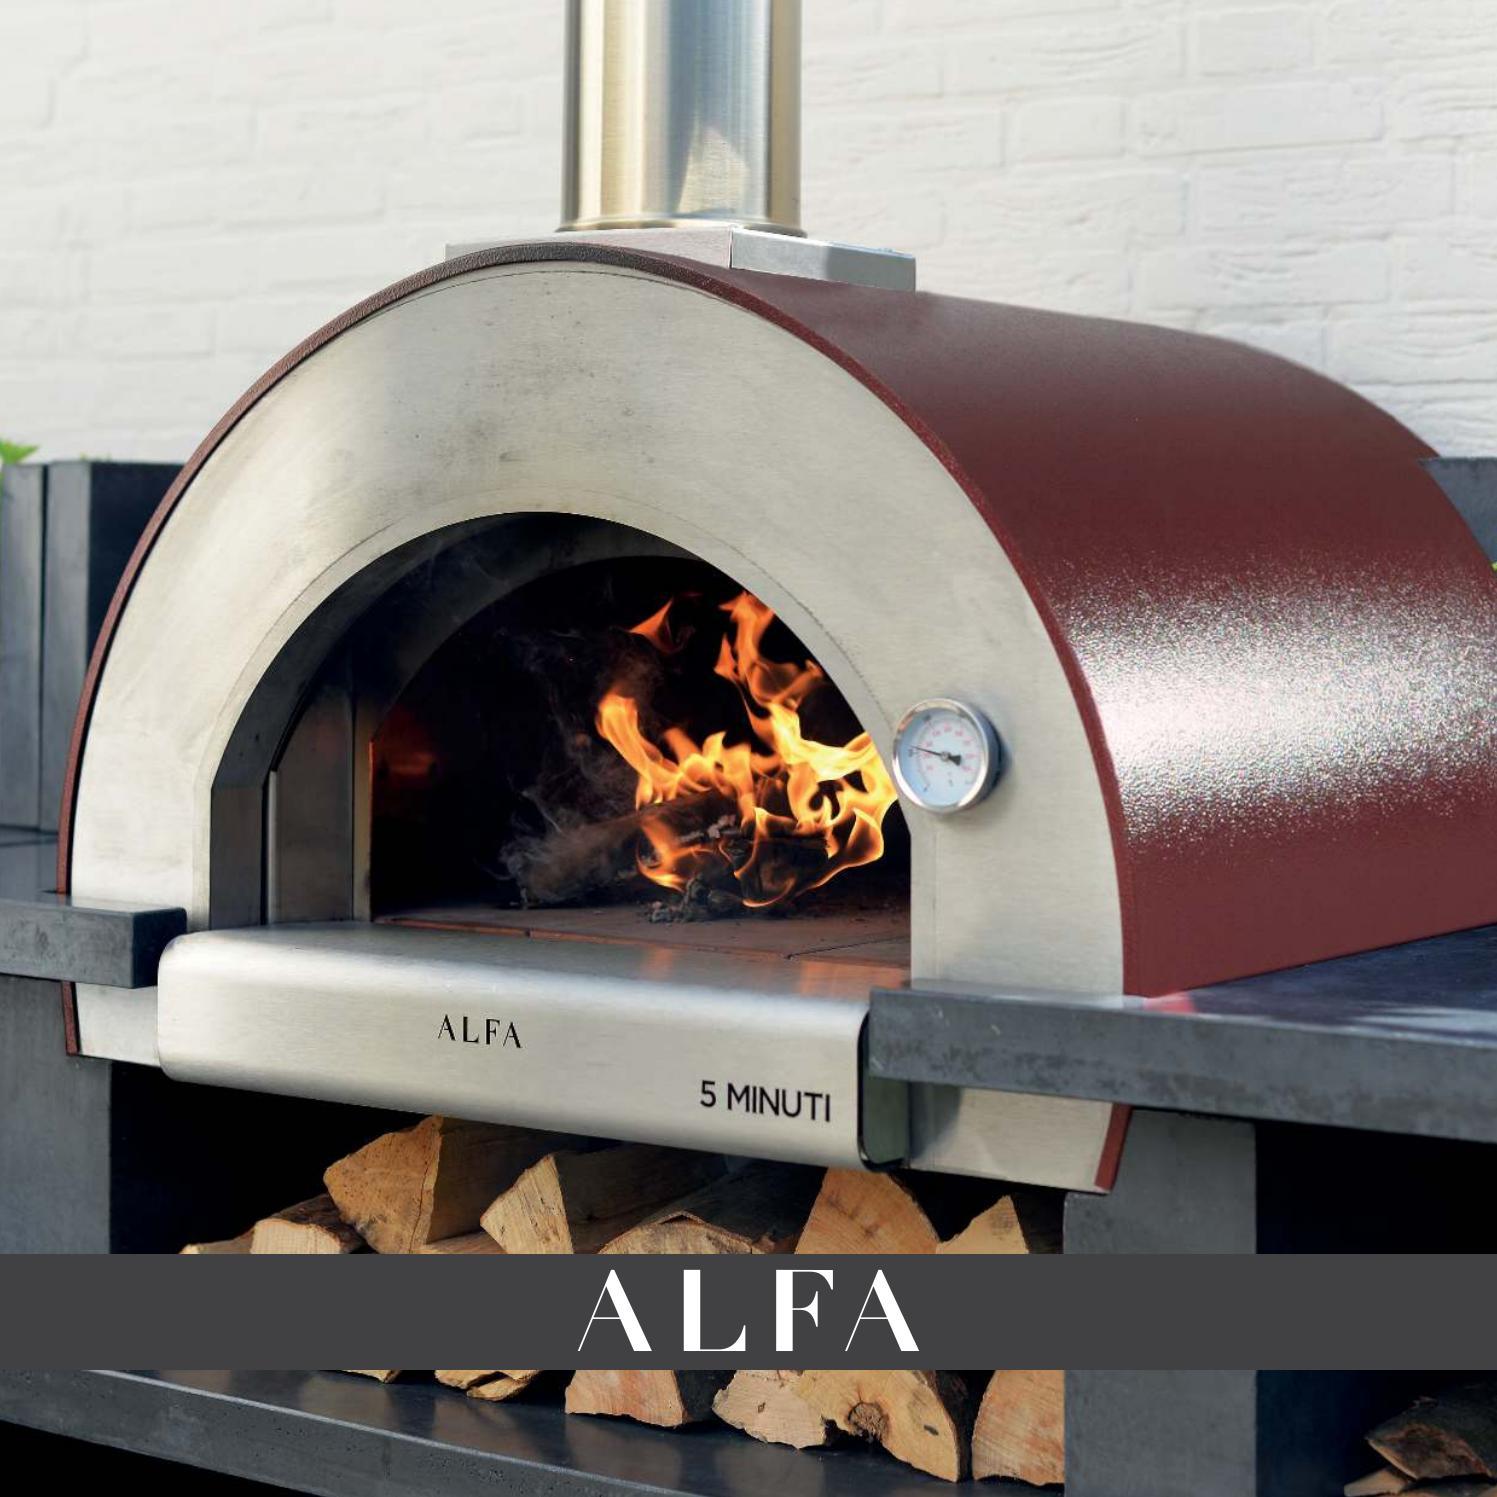 Thermomètre Four À Pain 500 catalogue alfa pizzasas sivac - issuu